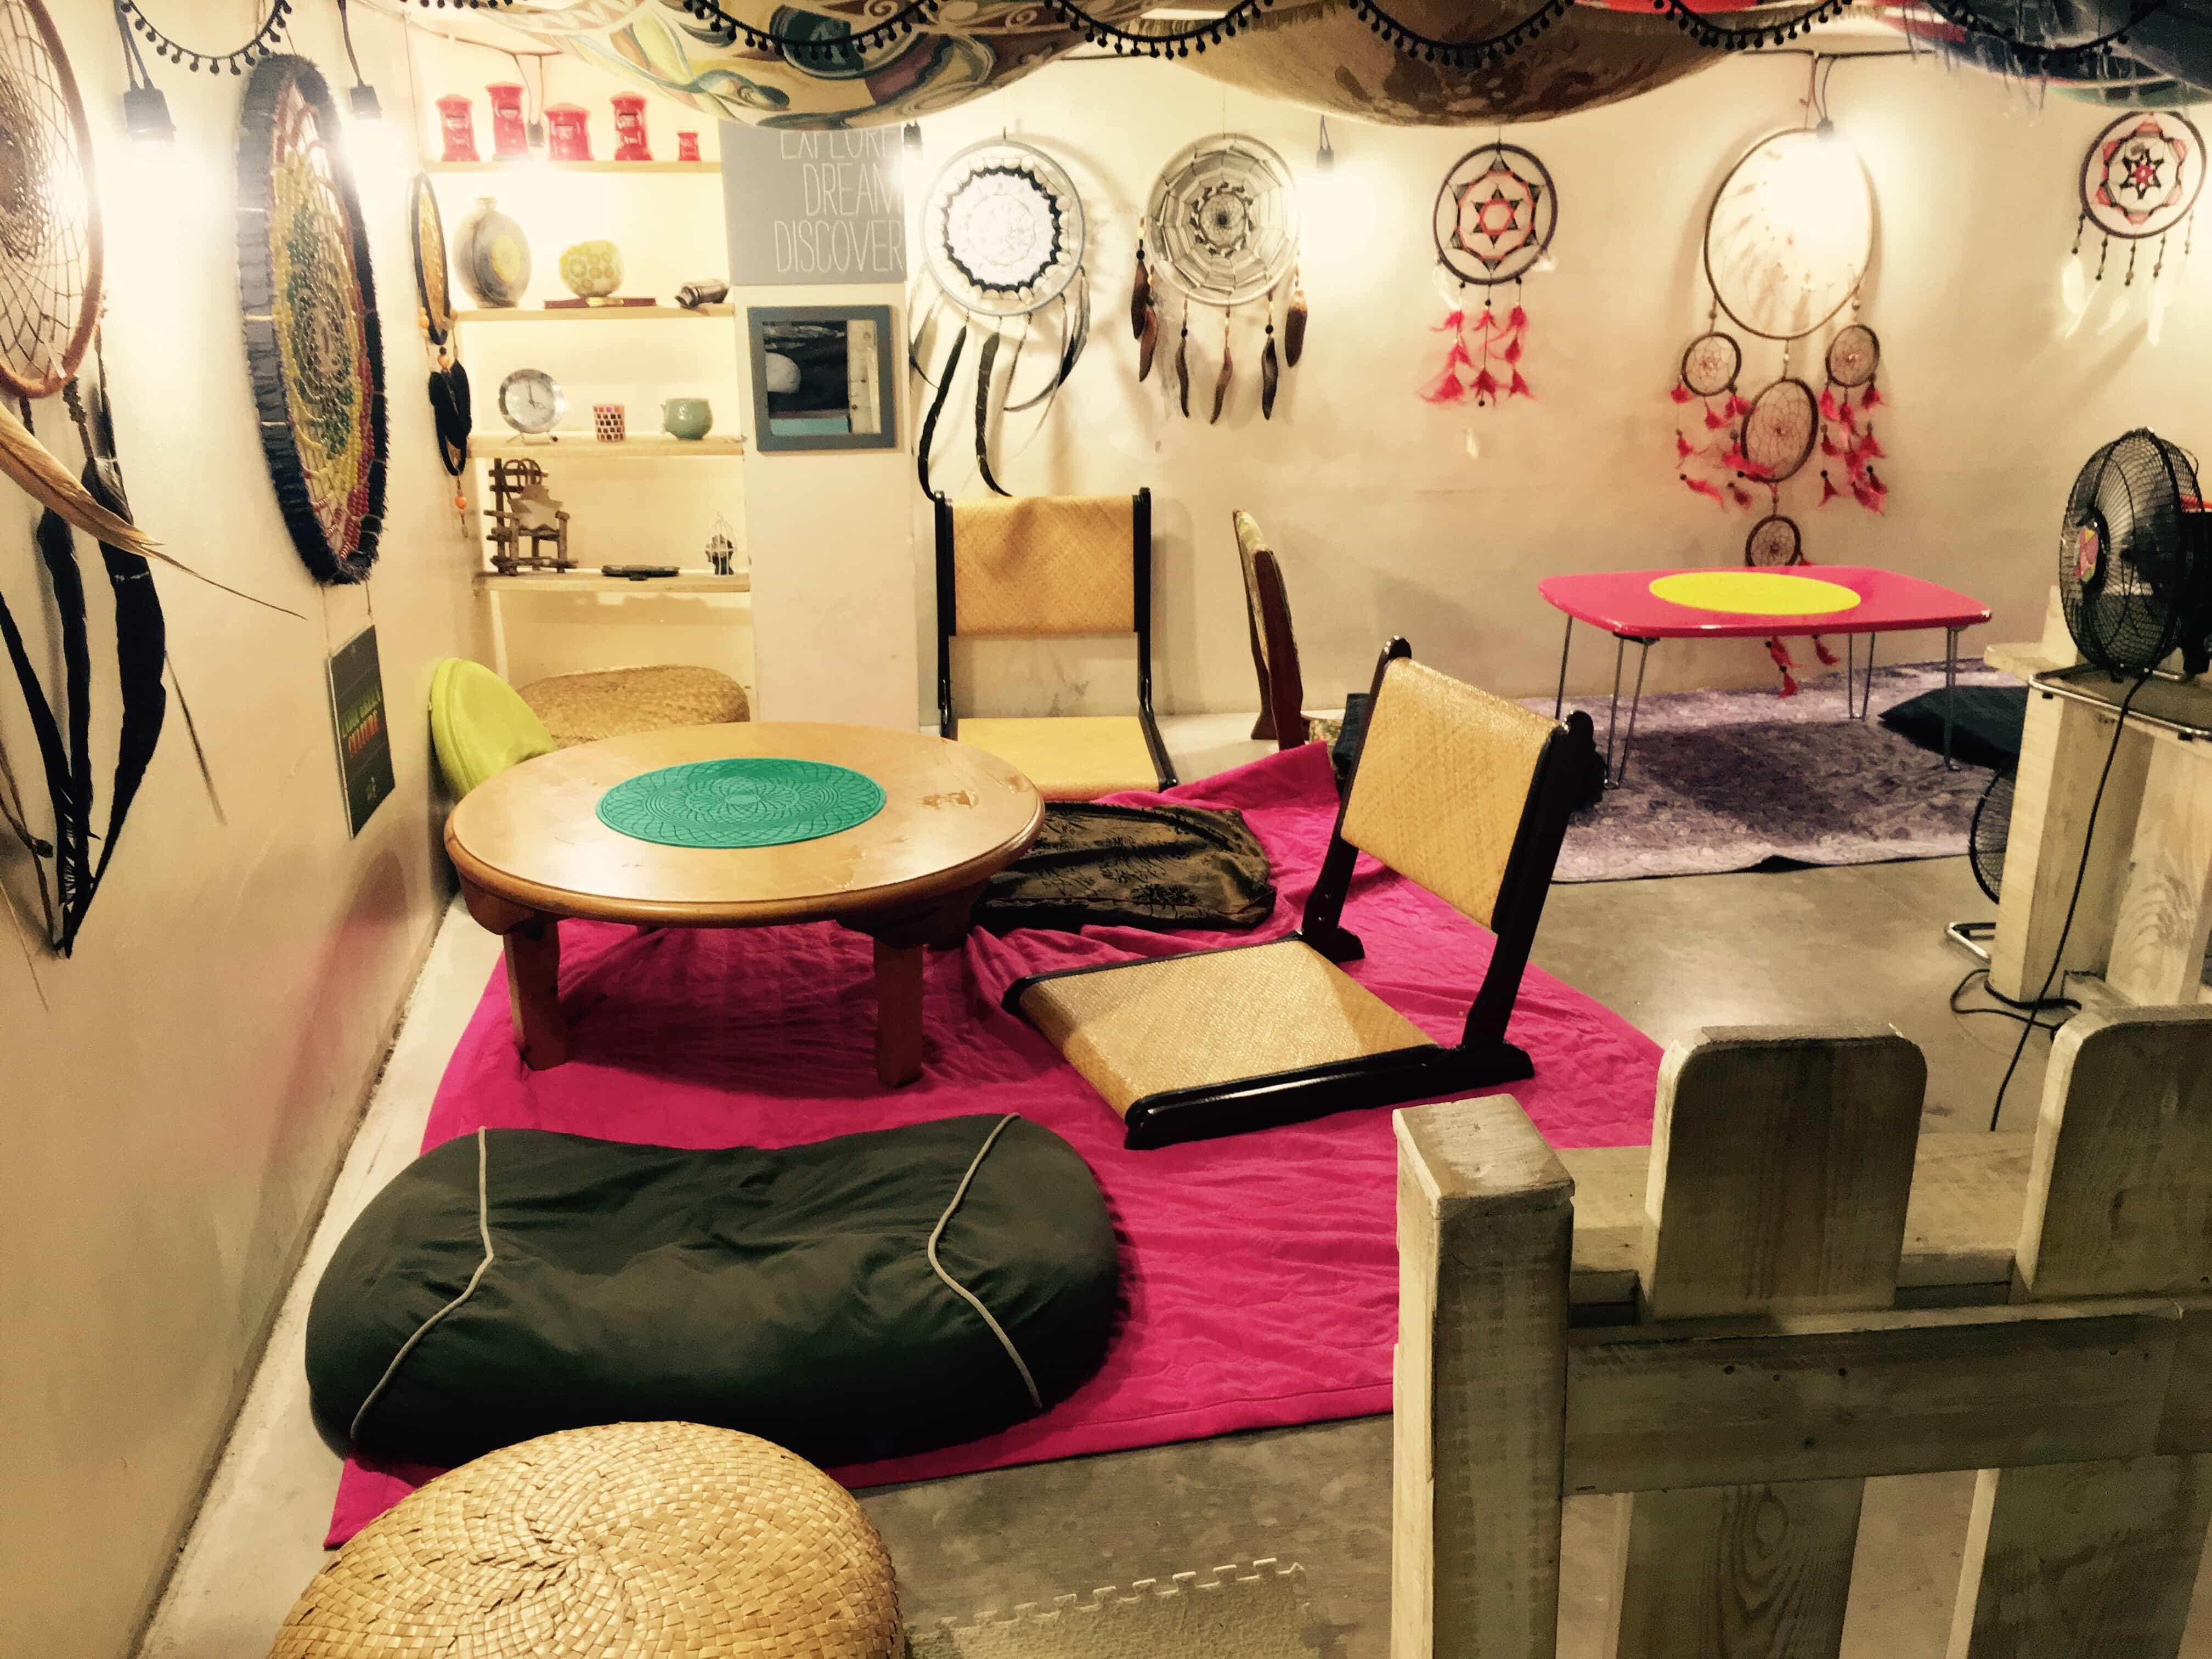 Dreamland Arts & Crafts Cafe, Tagaytay tourist spots